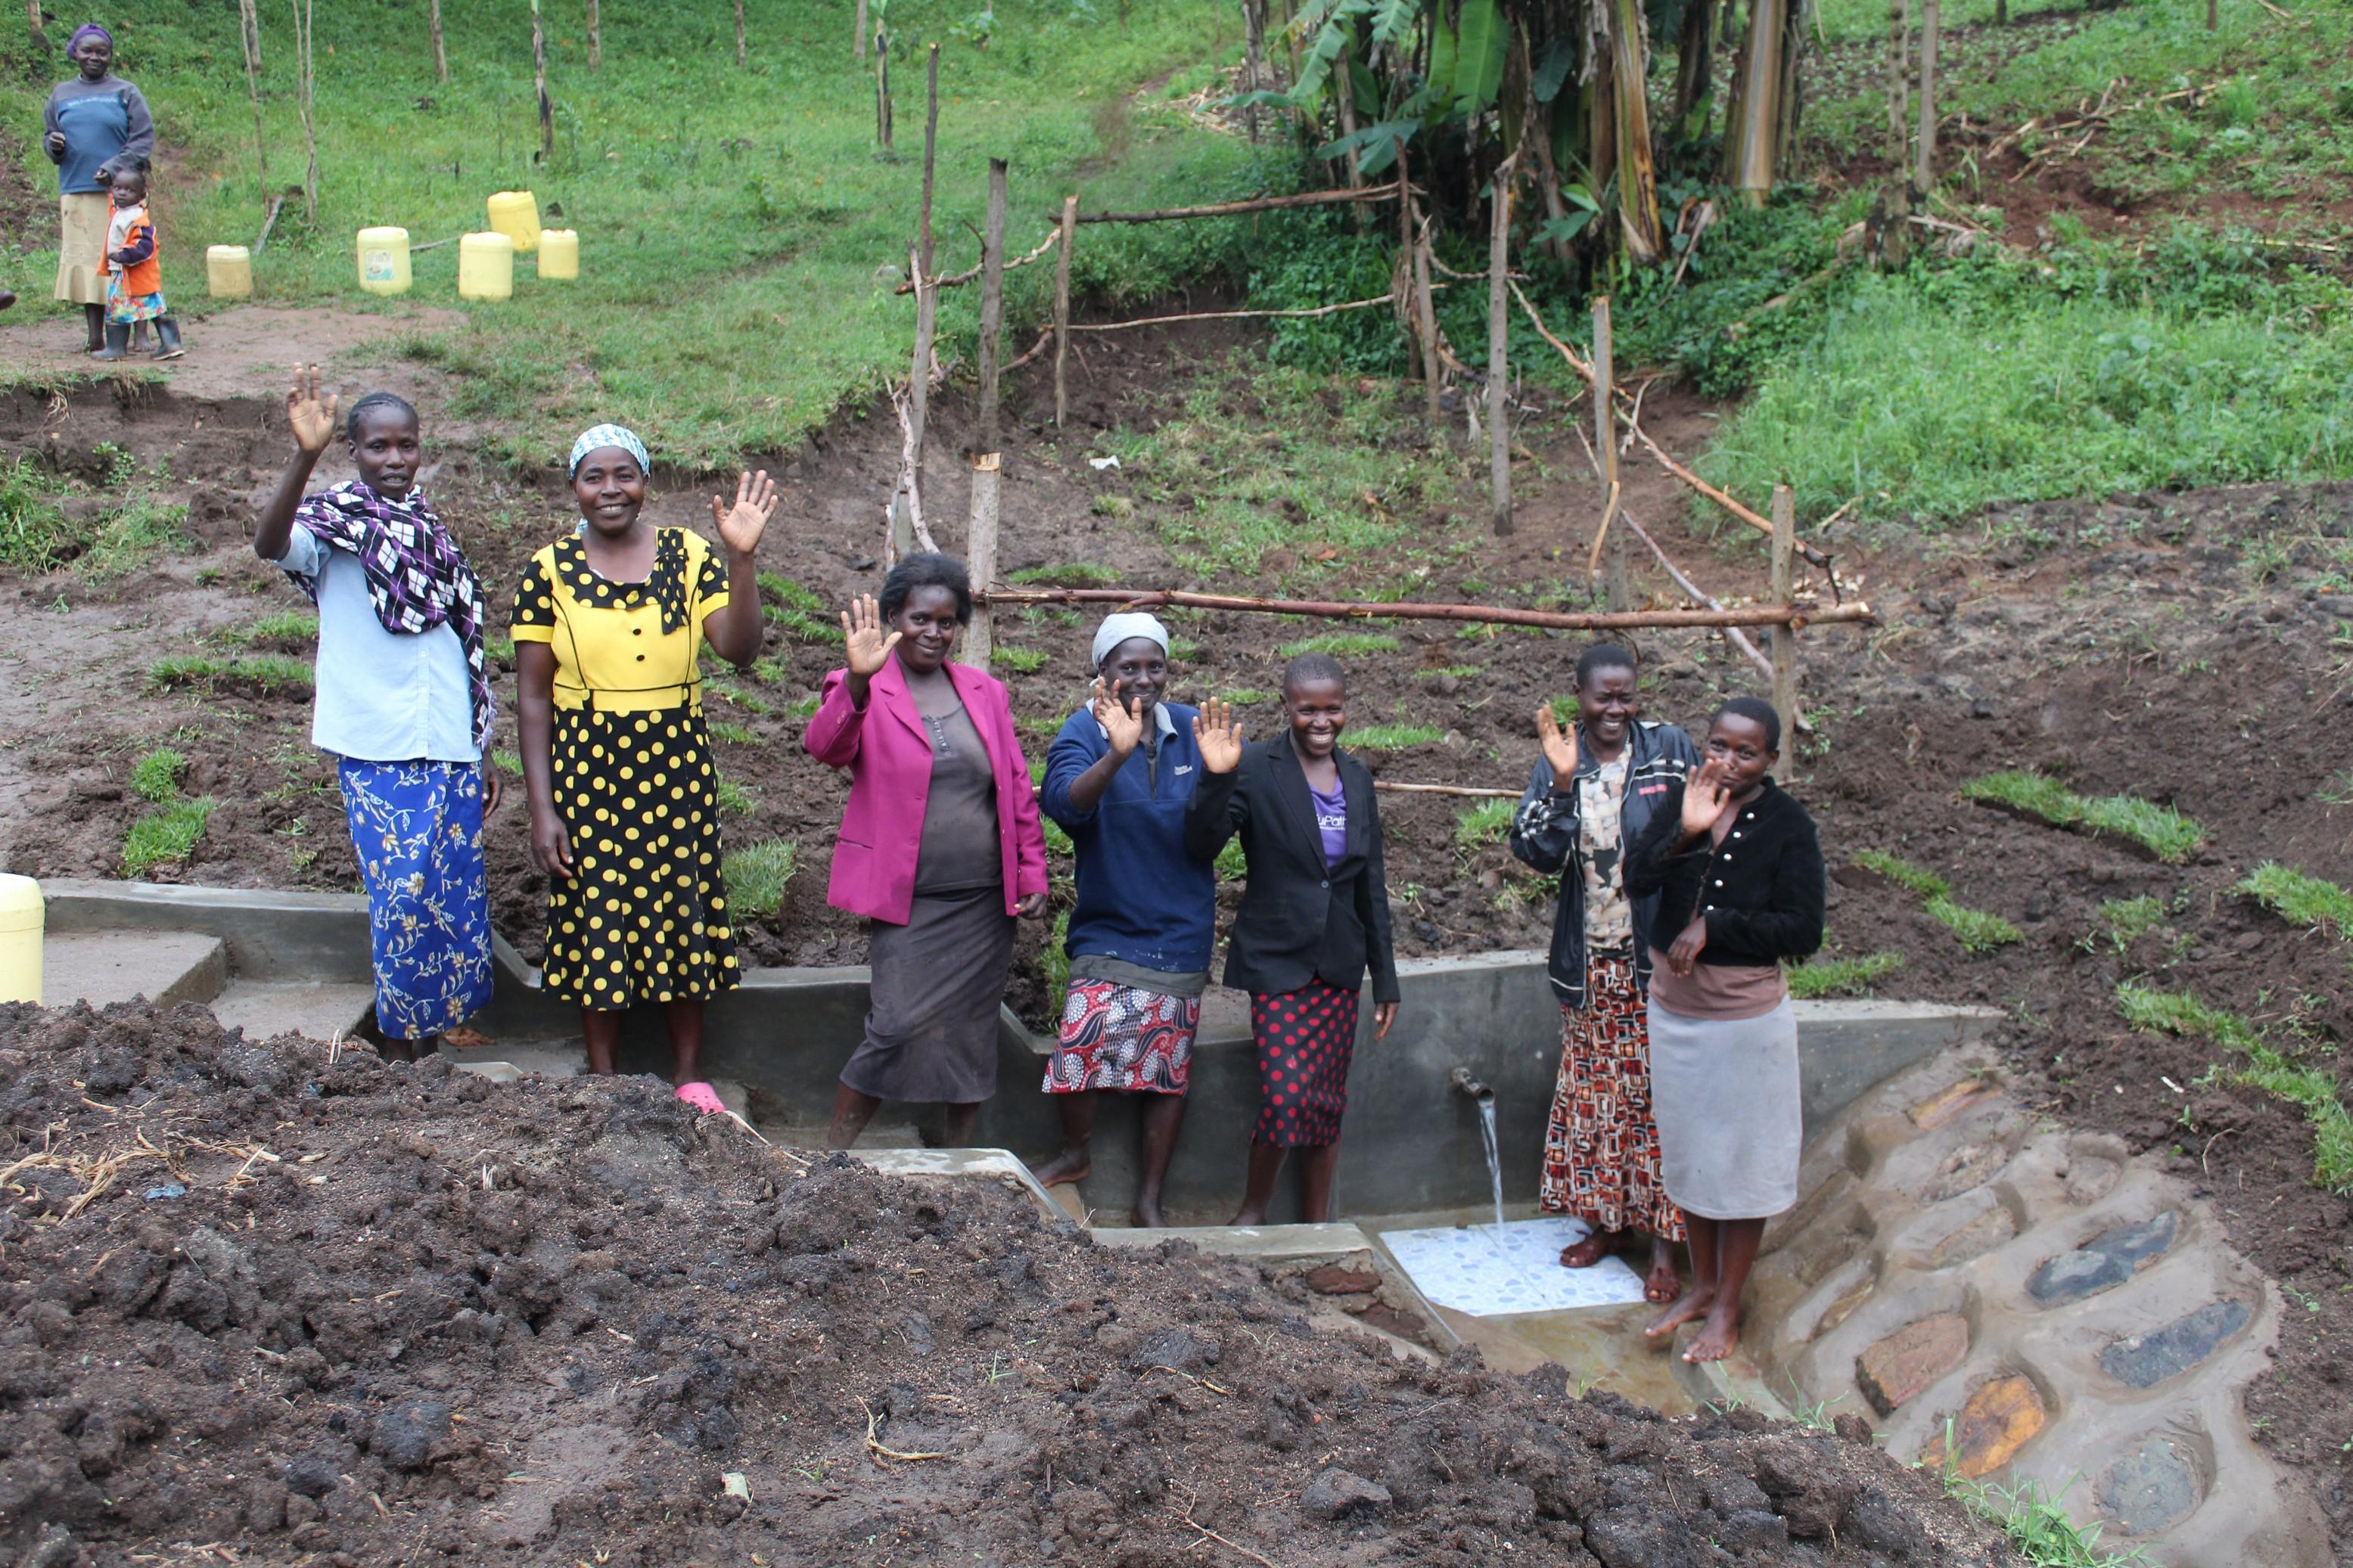 The Water Project : 39-kenya19152-happy-community-members